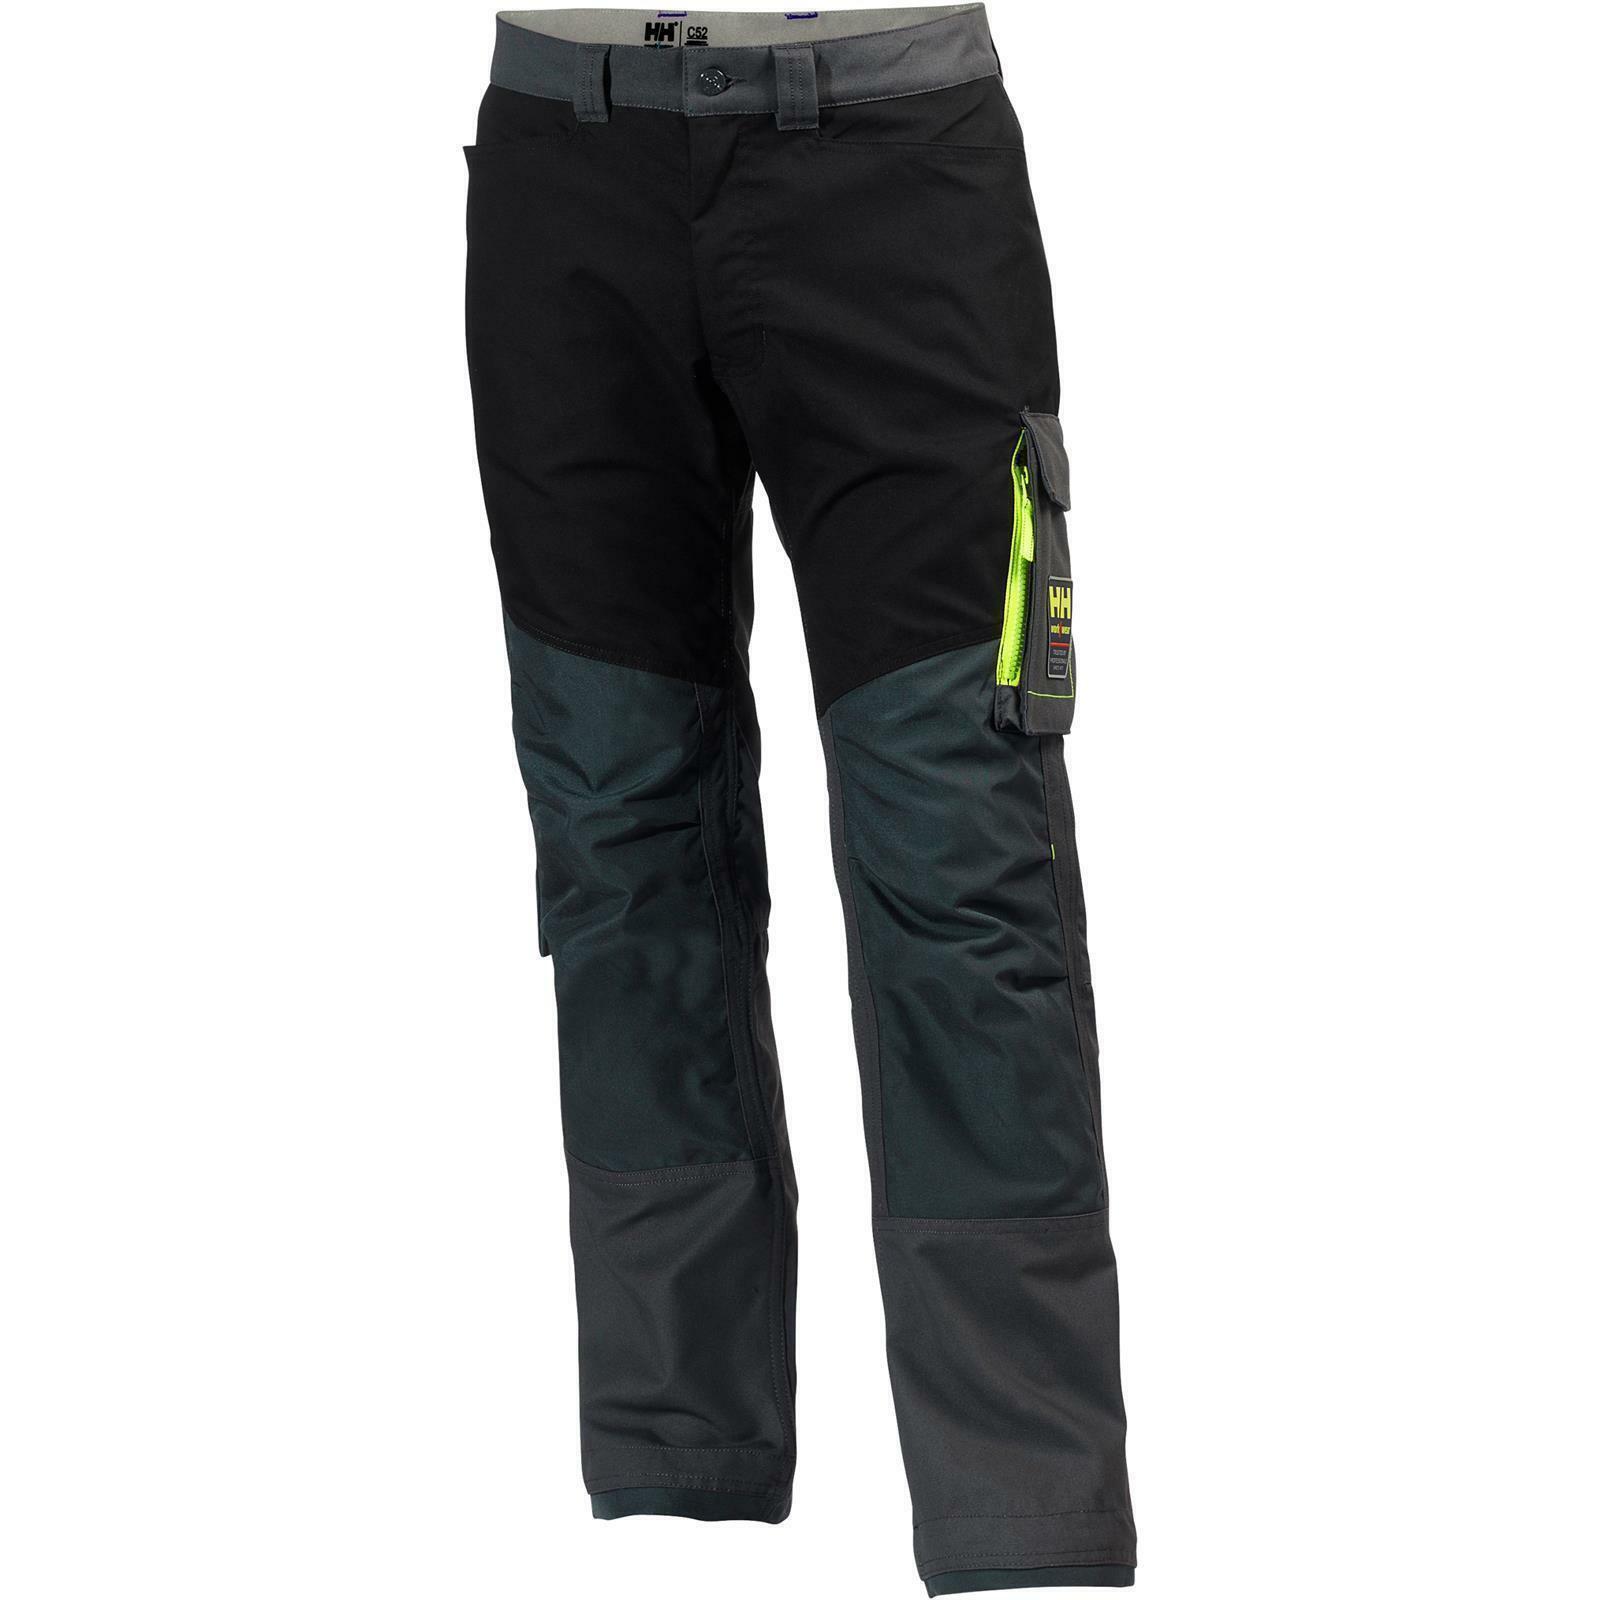 HH Aker Bundhose dunkelgrau schwarz Gr. 54 54 54   Shop    Produktqualität  957d43